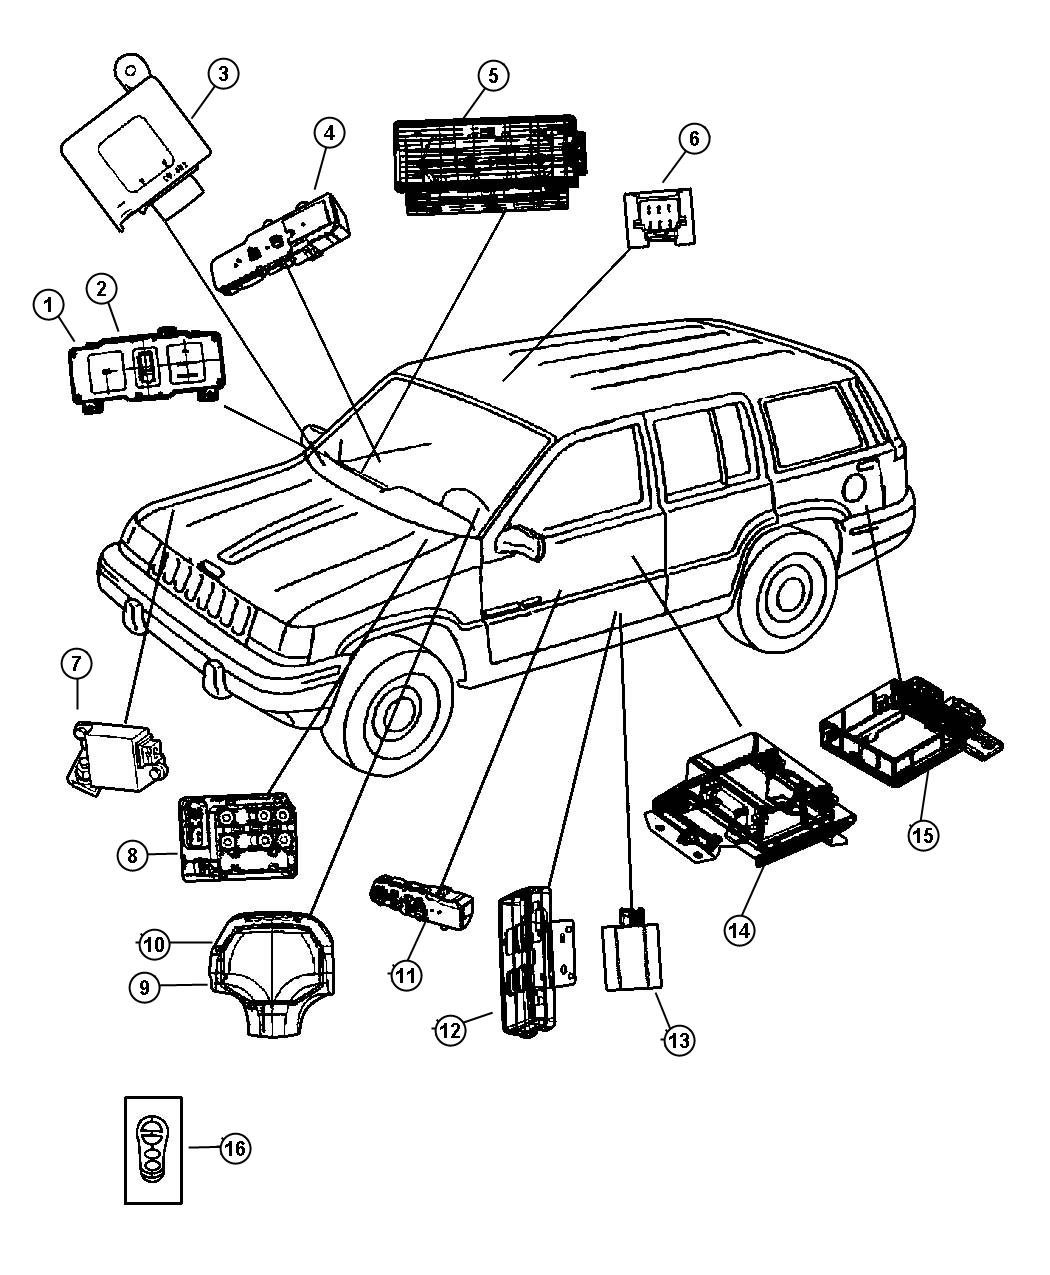 00 Oldsmobile Radio Wiring Diagram. Oldsmobile. Auto